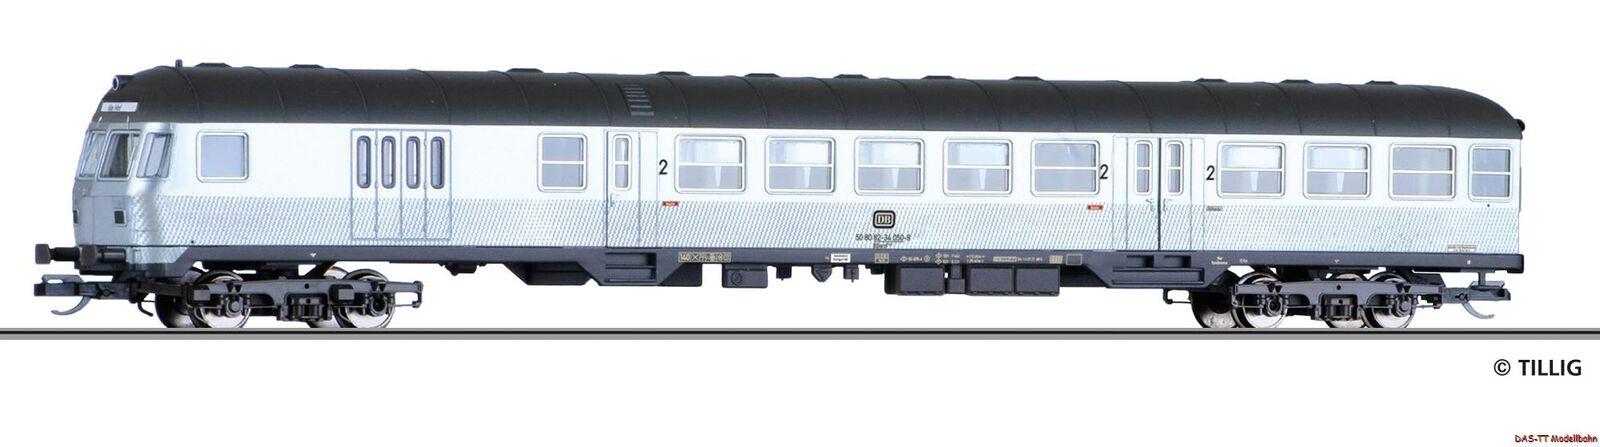 TT carrello fiscali 2.kl. BDNF 740 DB Ep. IV Tillig 13845 NUOVO